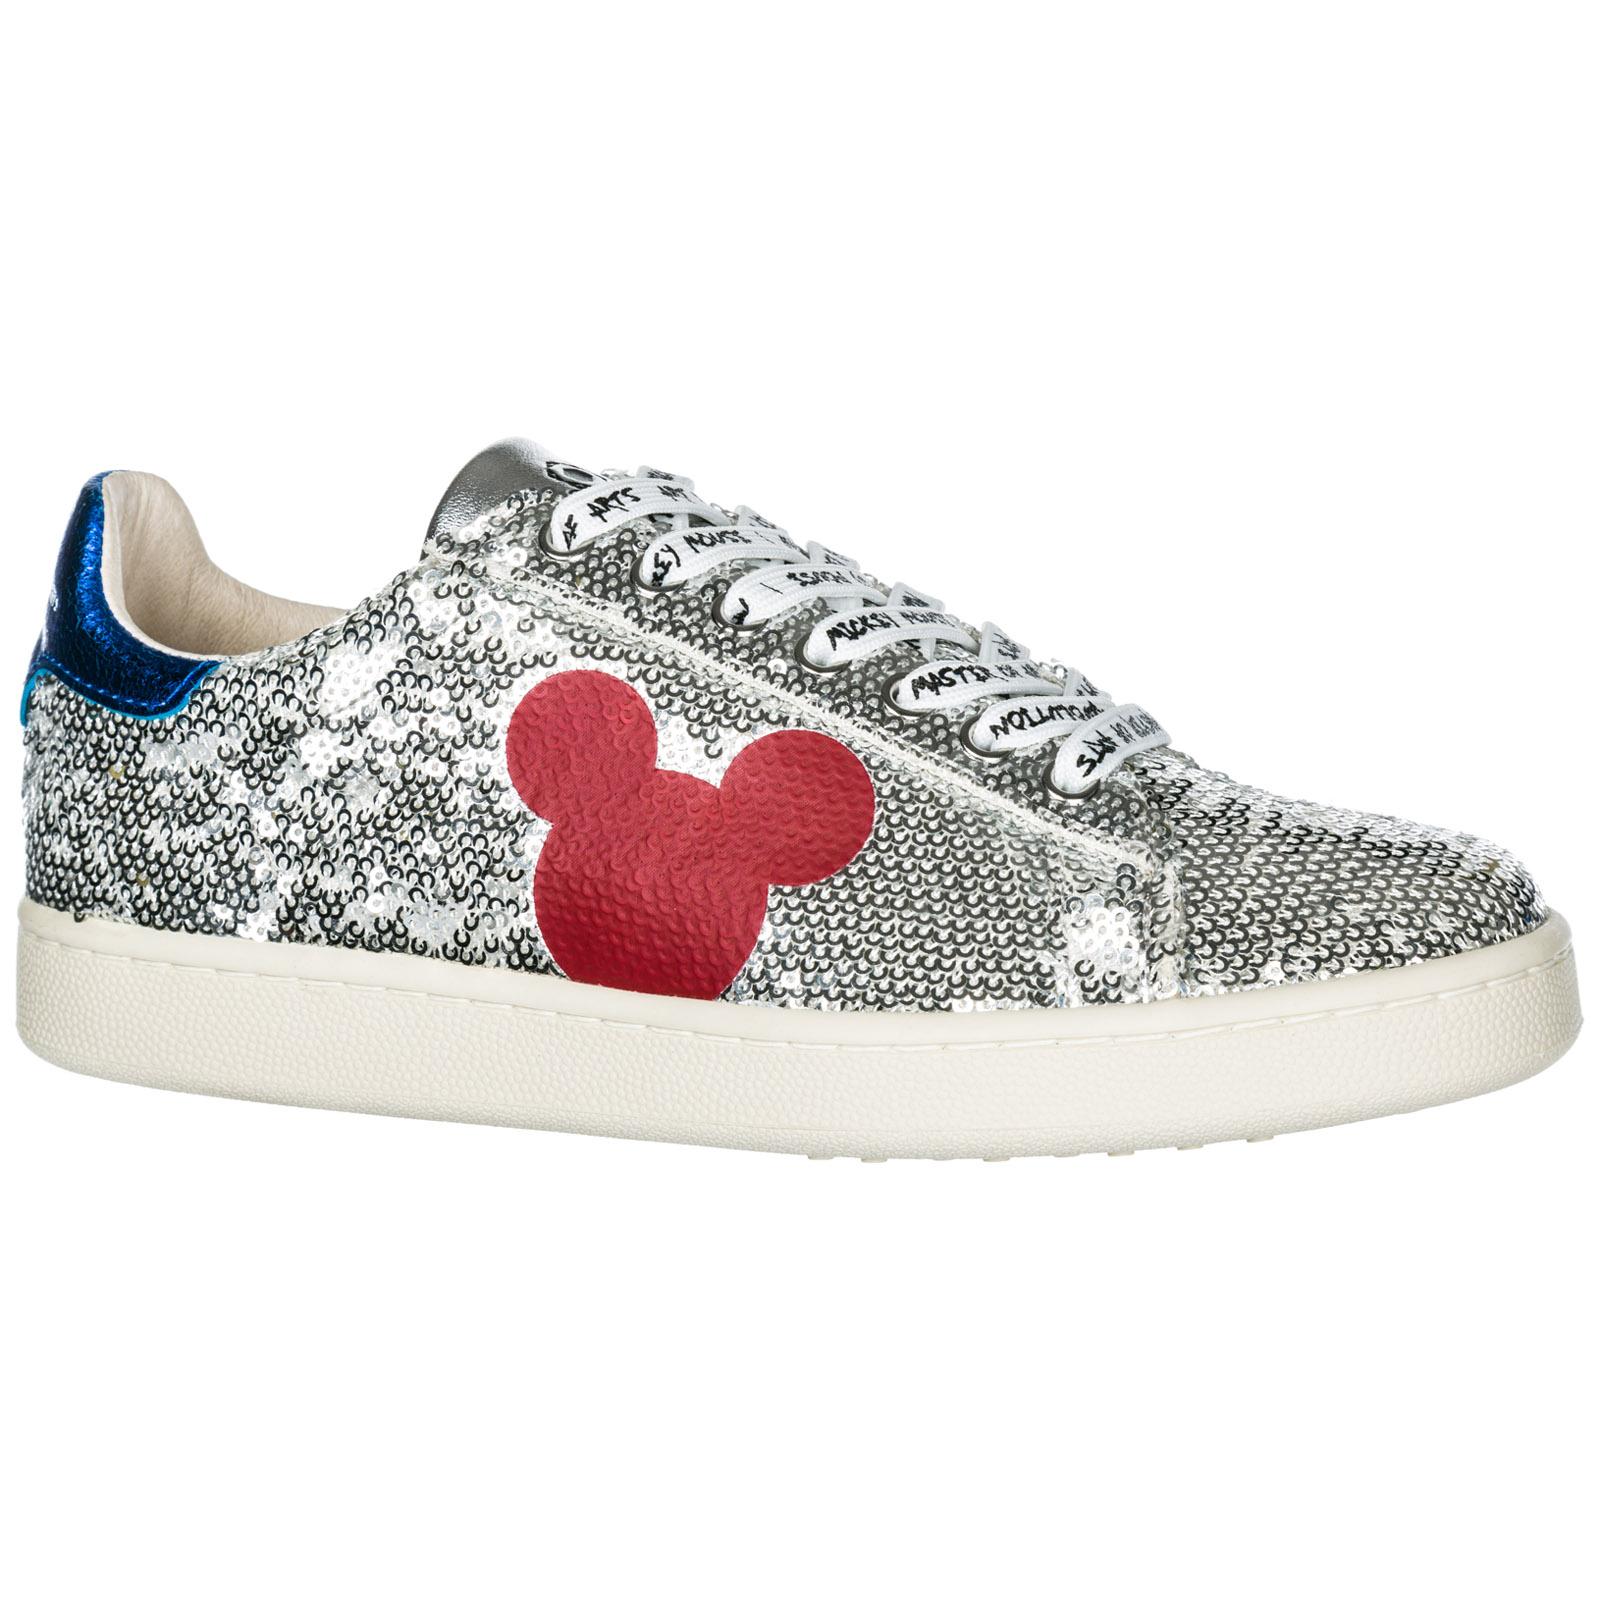 Disney Mouse Damenschuhe Mickey Leder Schuhe Turnschuhe Damen Sneakers TFKJlc13u